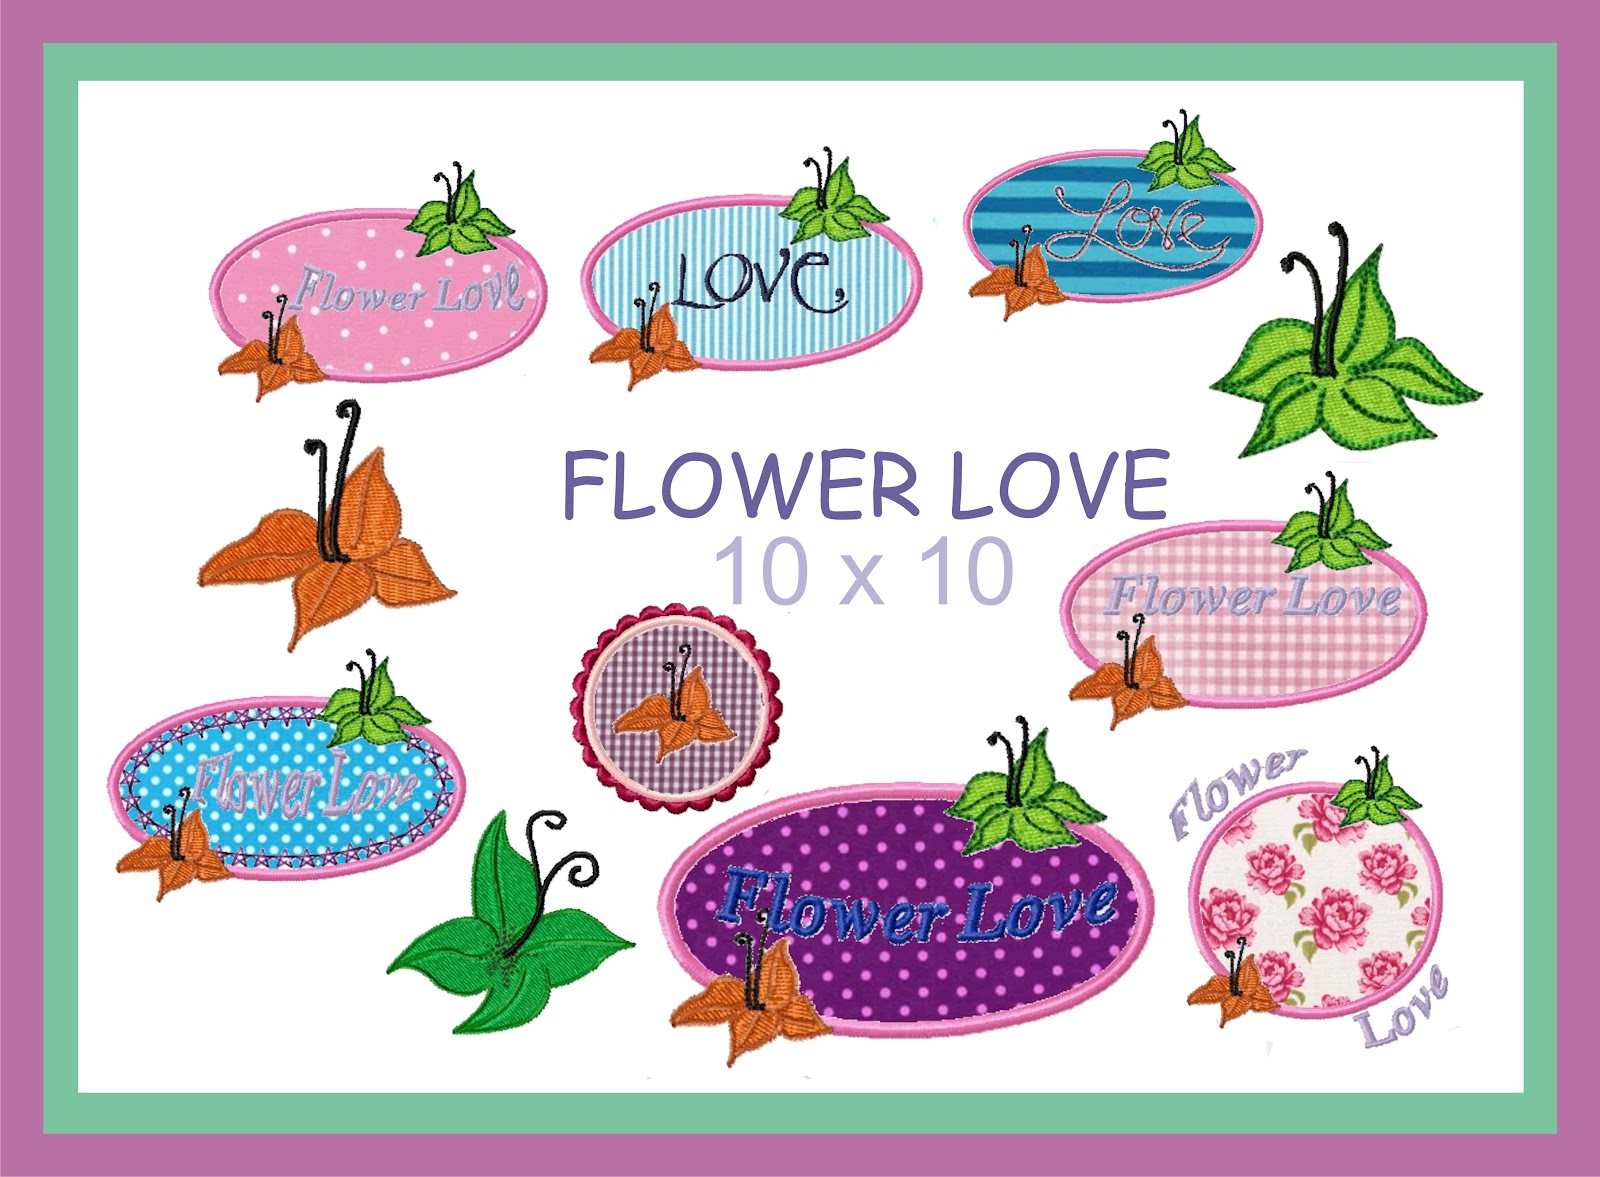 mamalu lu flower love meine erste stickdatei. Black Bedroom Furniture Sets. Home Design Ideas